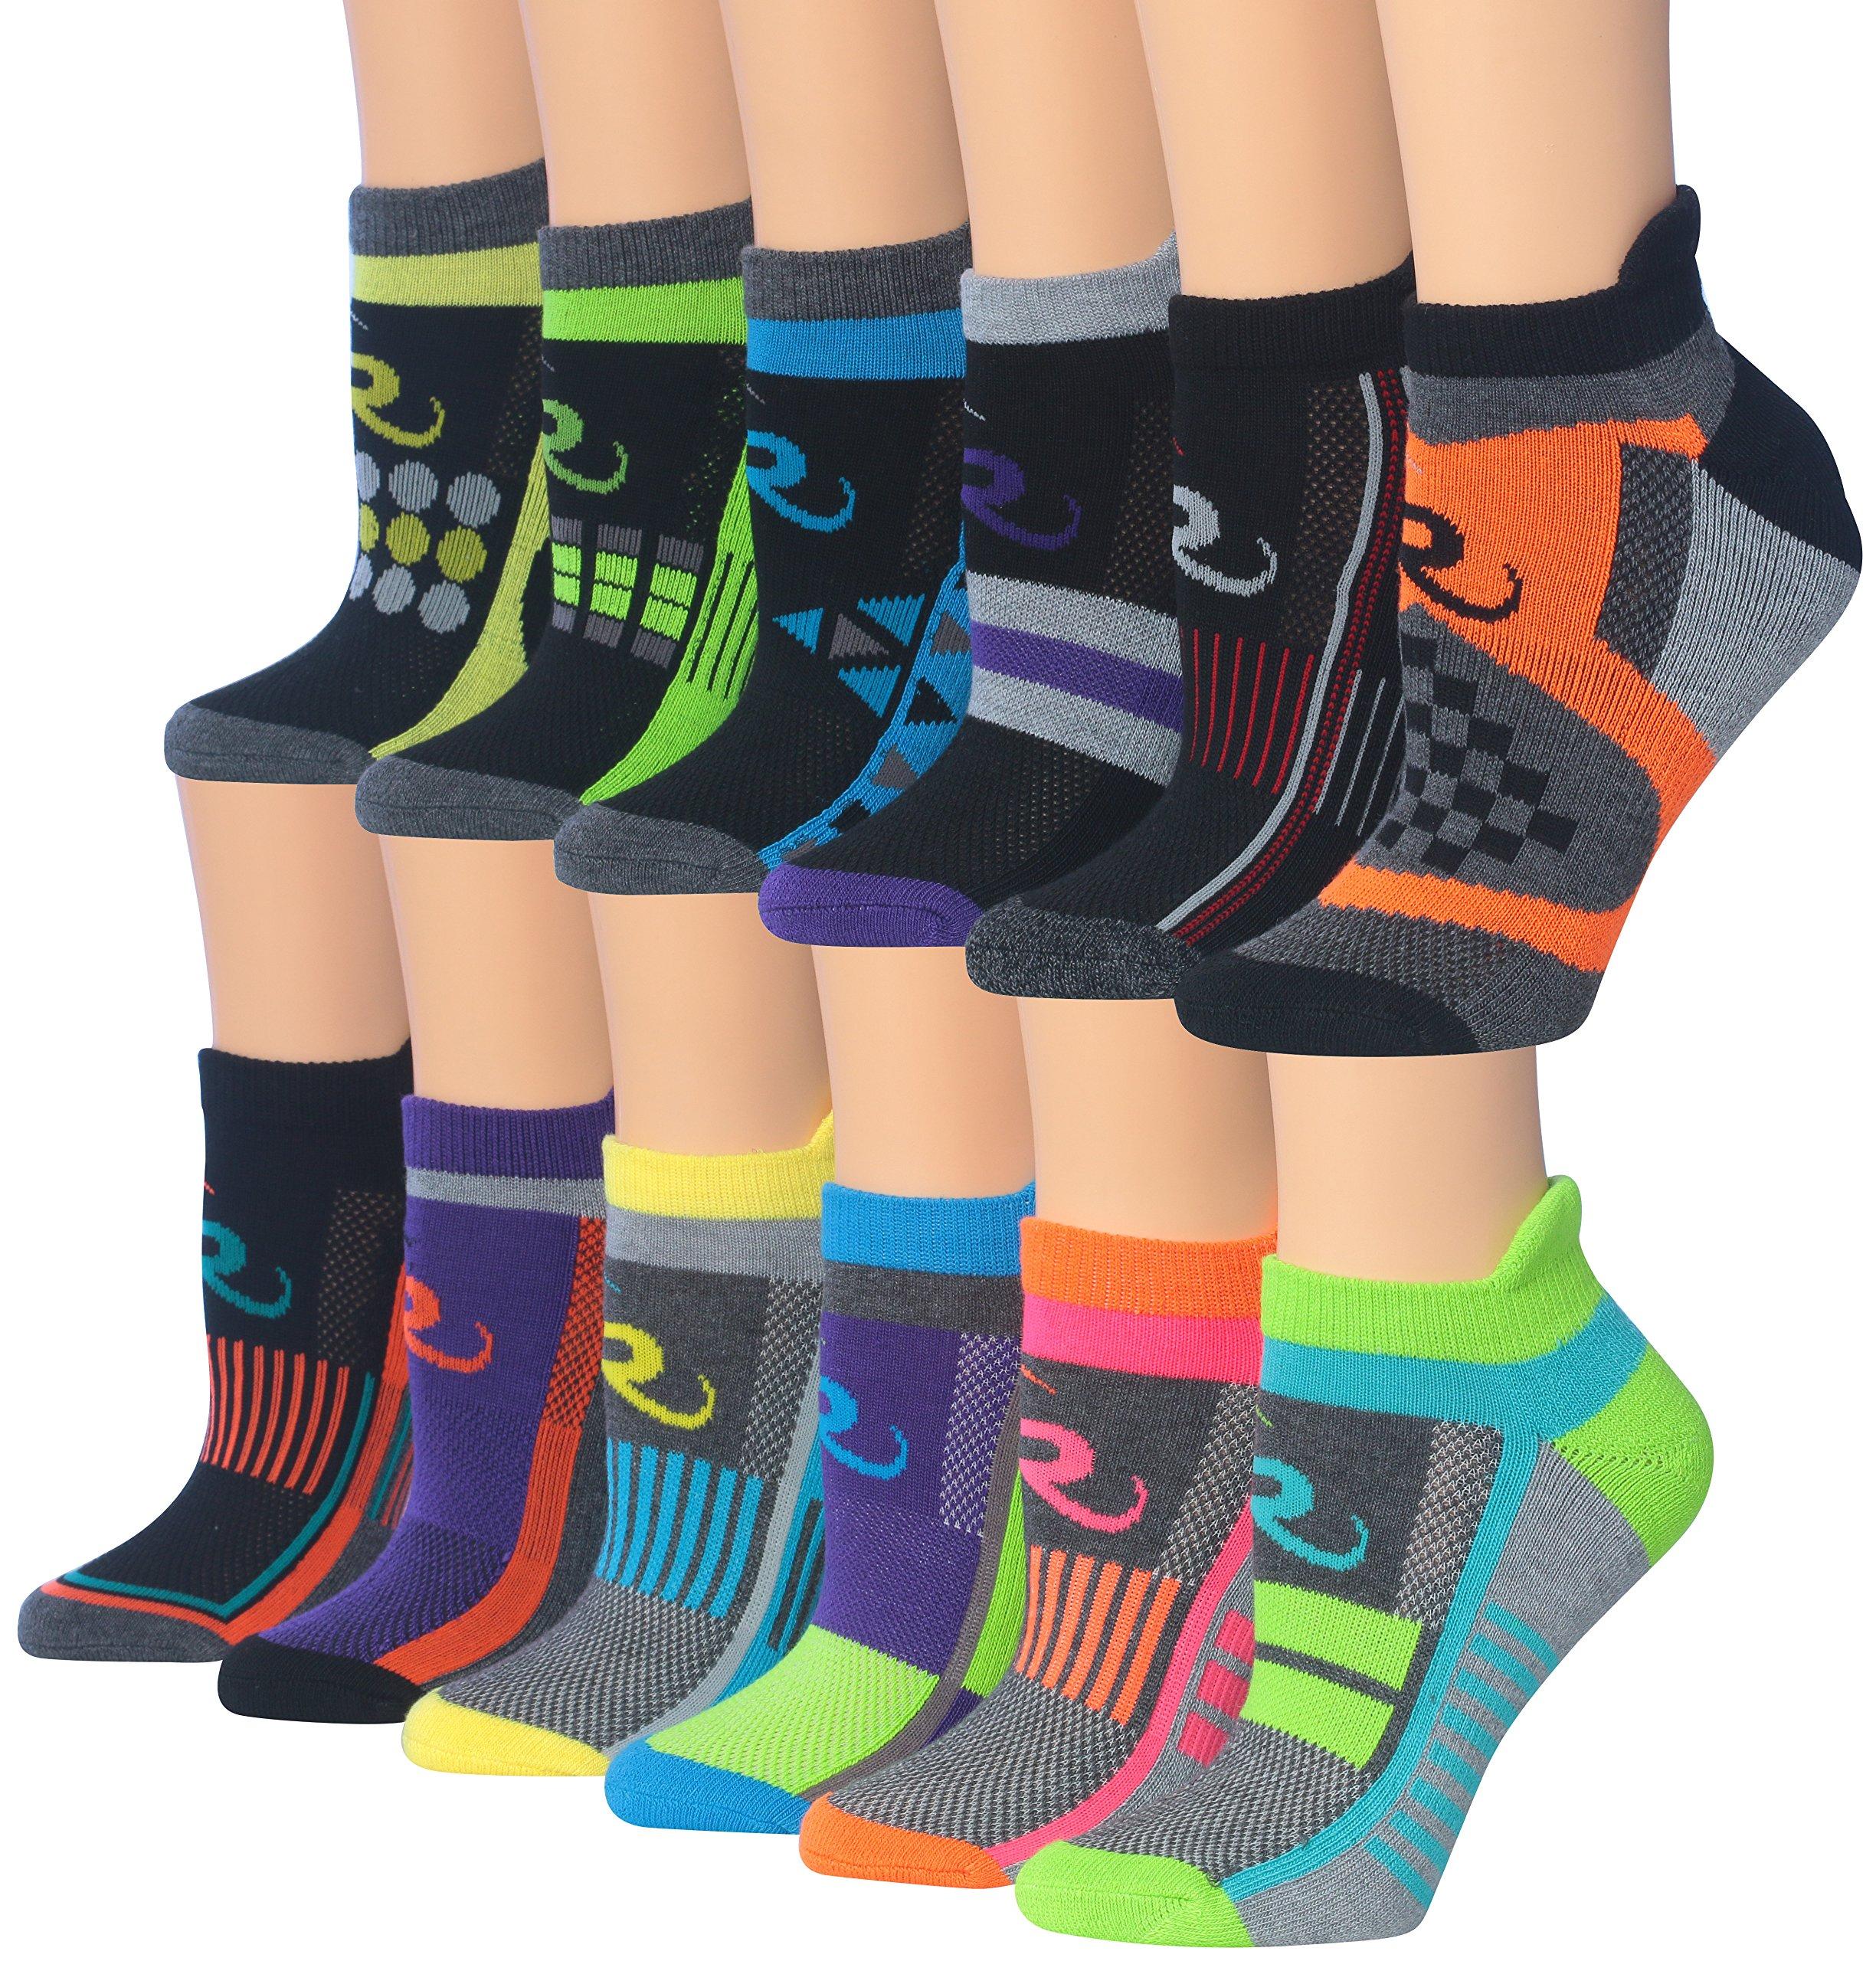 Ronnox Women's 12-Pairs Low Cut Running Athletic Performance Socks, RLT12-AB, Medium/Large